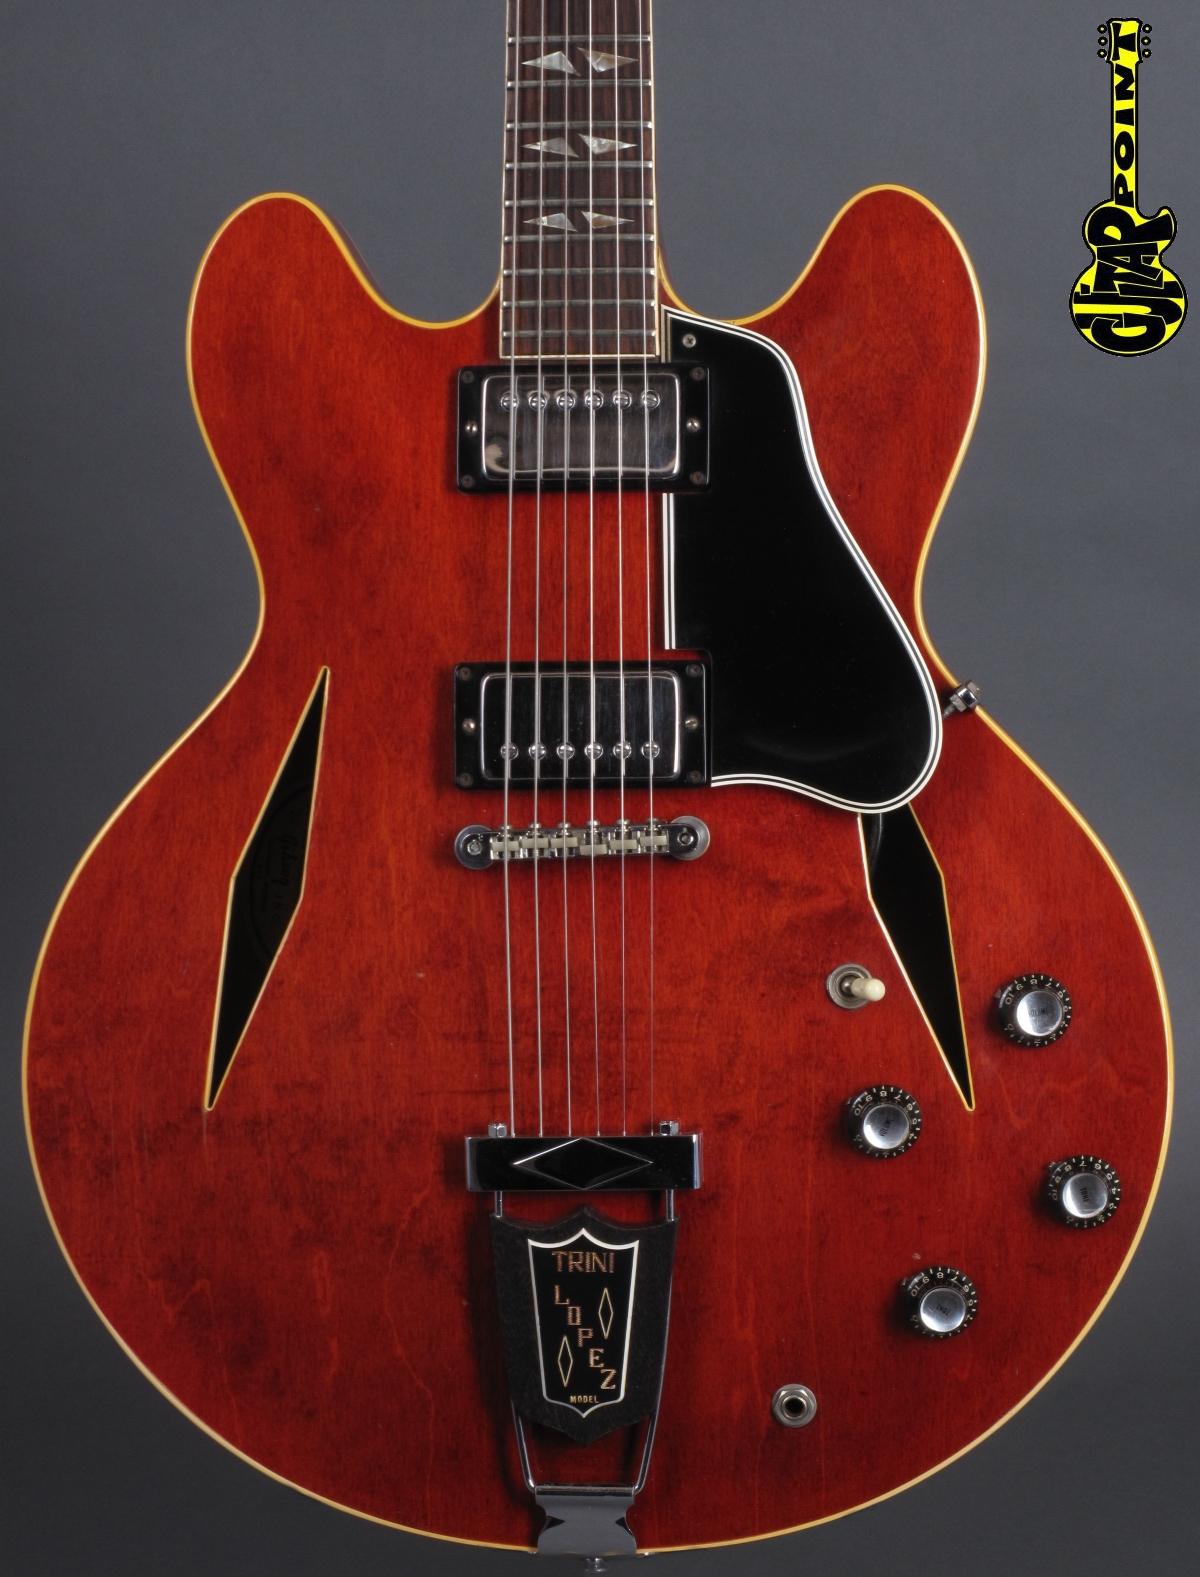 1966 Gibson Trini Lopez Standard - Cherry